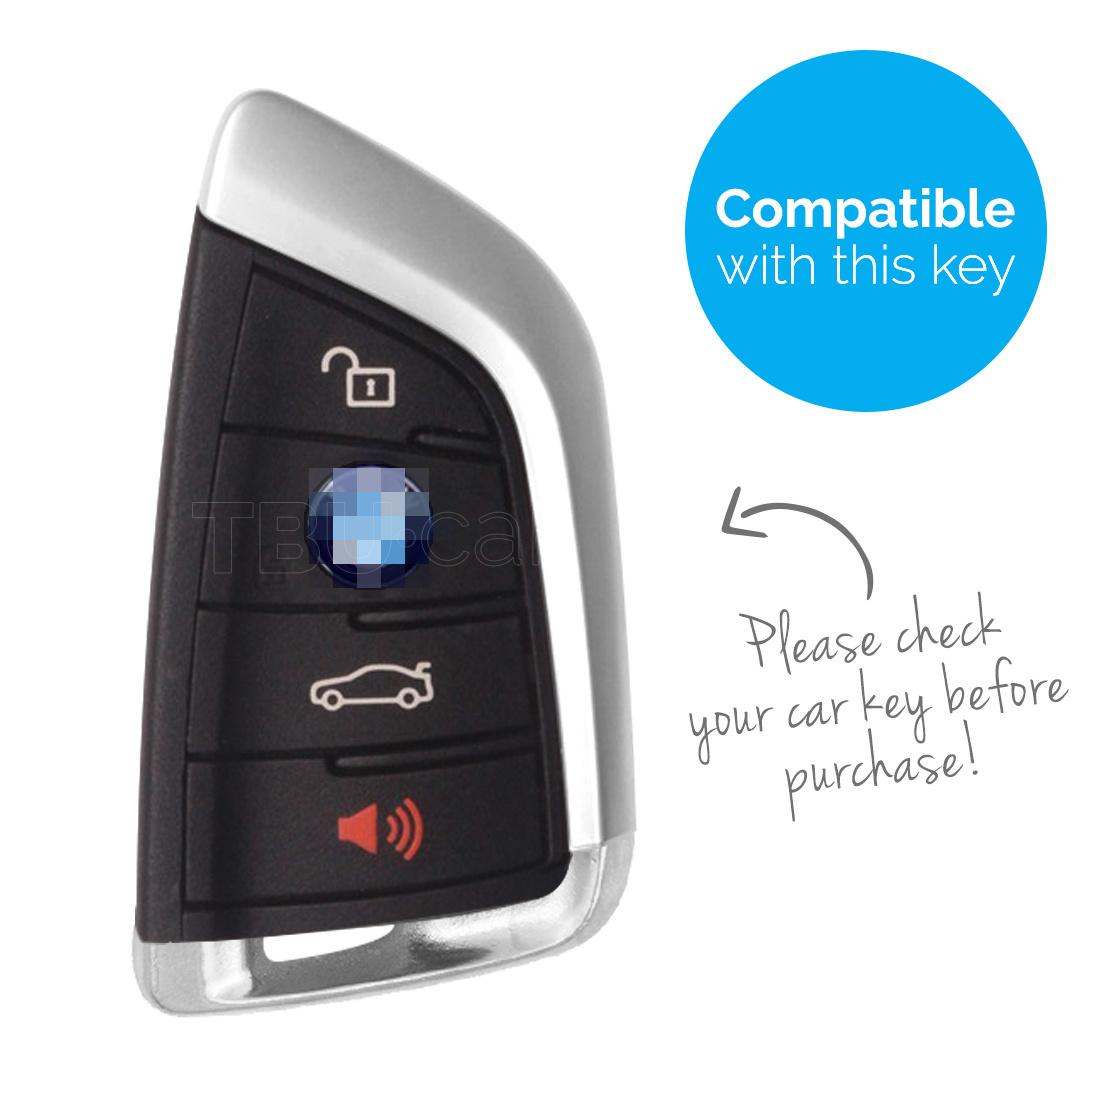 TBU car TBU car Autoschlüssel Hülle kompatibel mit BMW 4 Tasten (Keyless Entry) - Schutzhülle aus Silikon - Auto Schlüsselhülle Cover in Rott